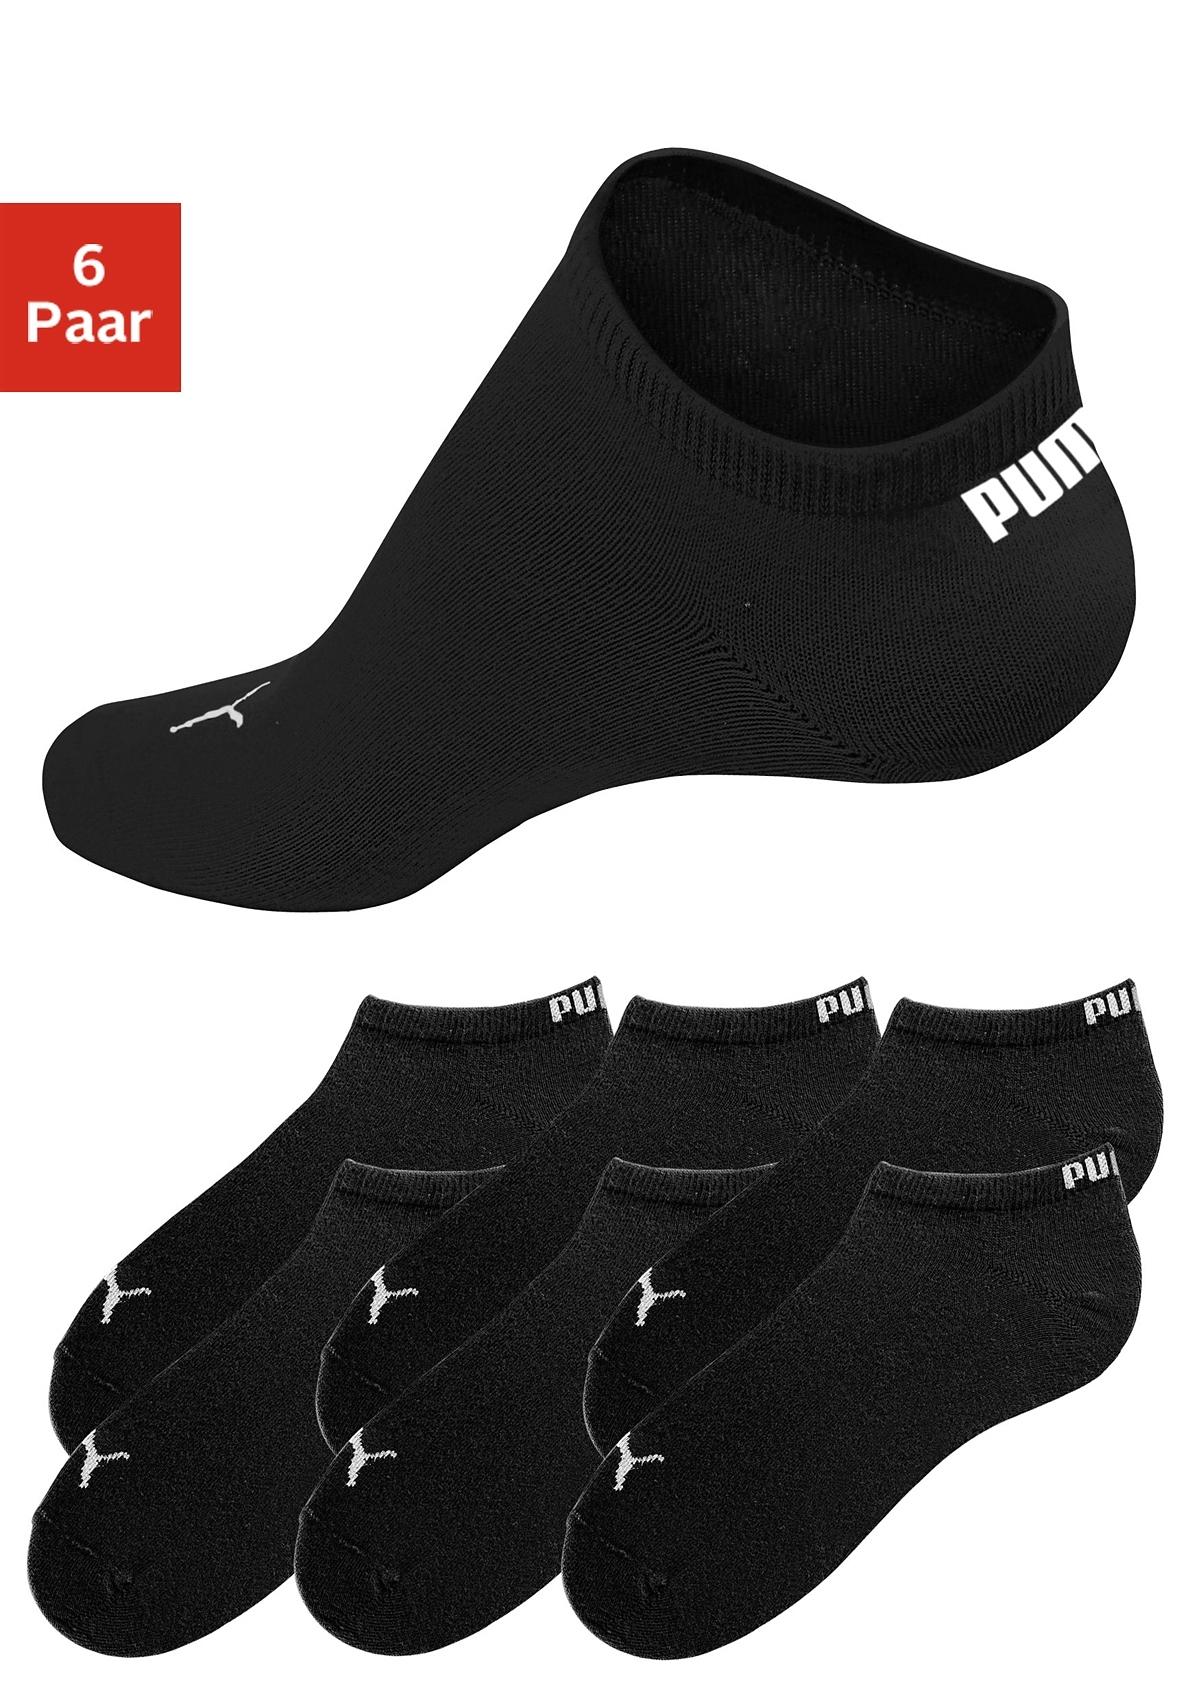 62166fc7d3fd3e Puma Anklets, set van 6 paar voordelig besteld | LASCANA